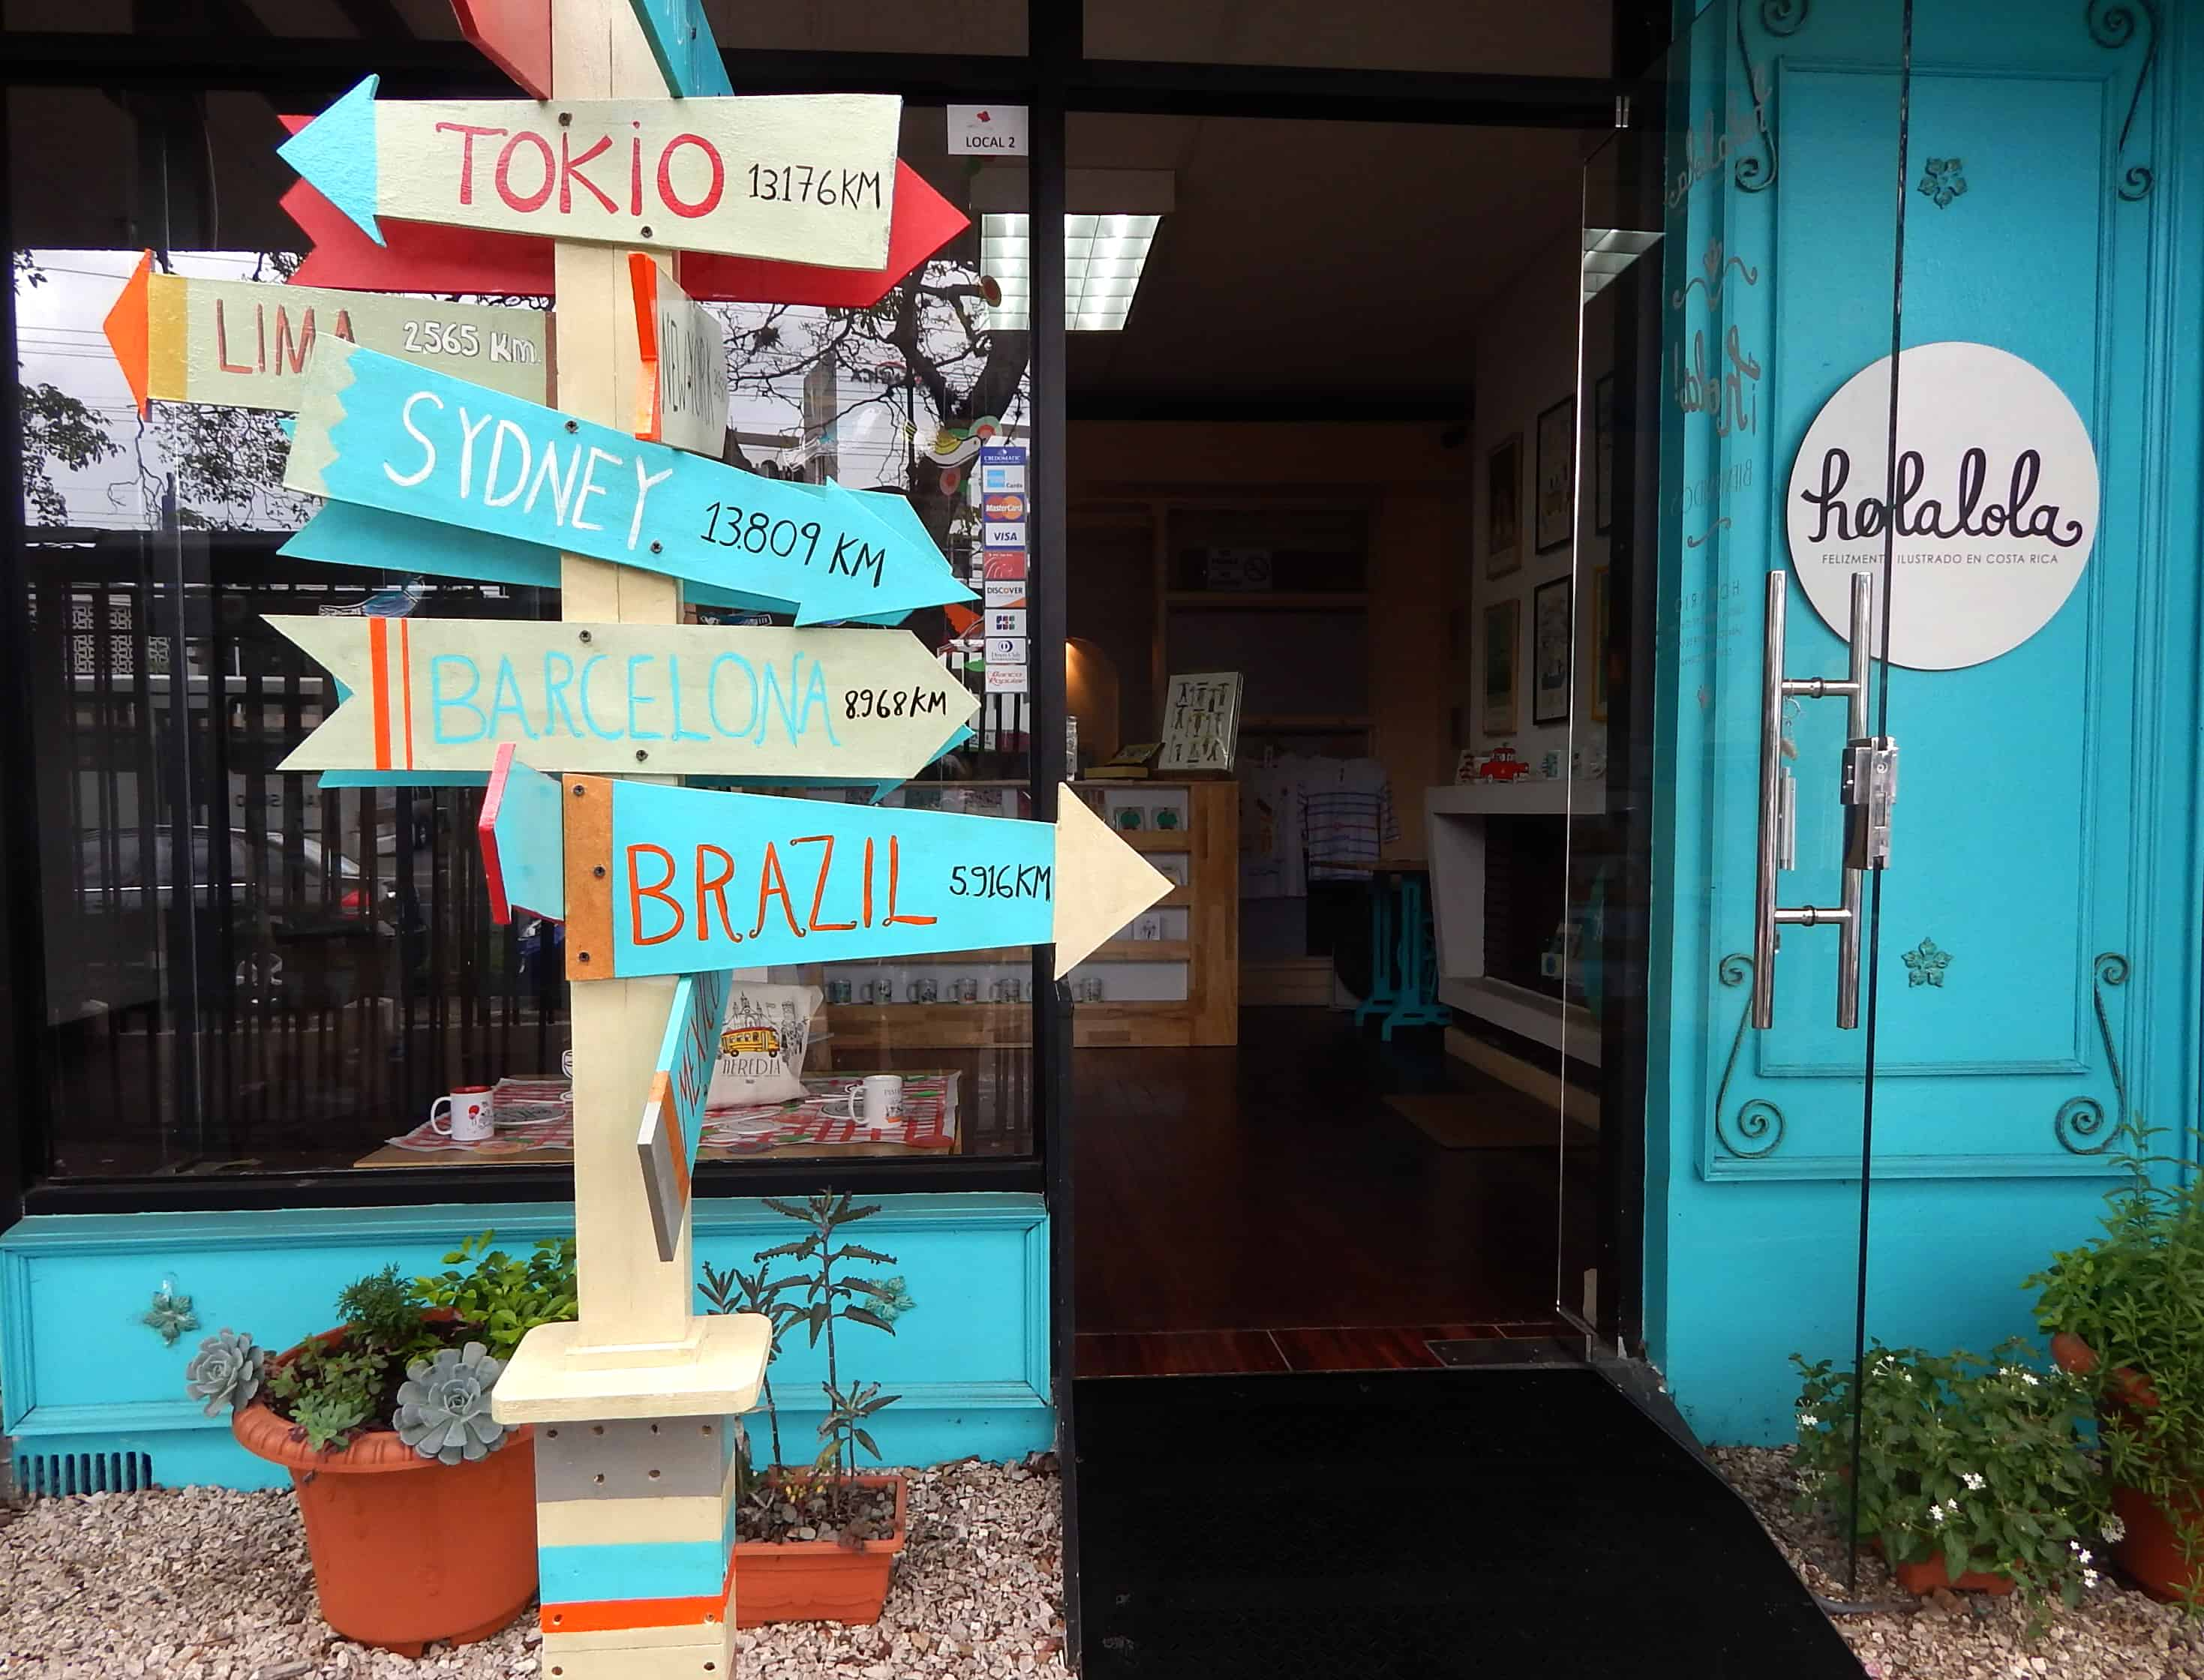 Holalola storefront in Los Yoses